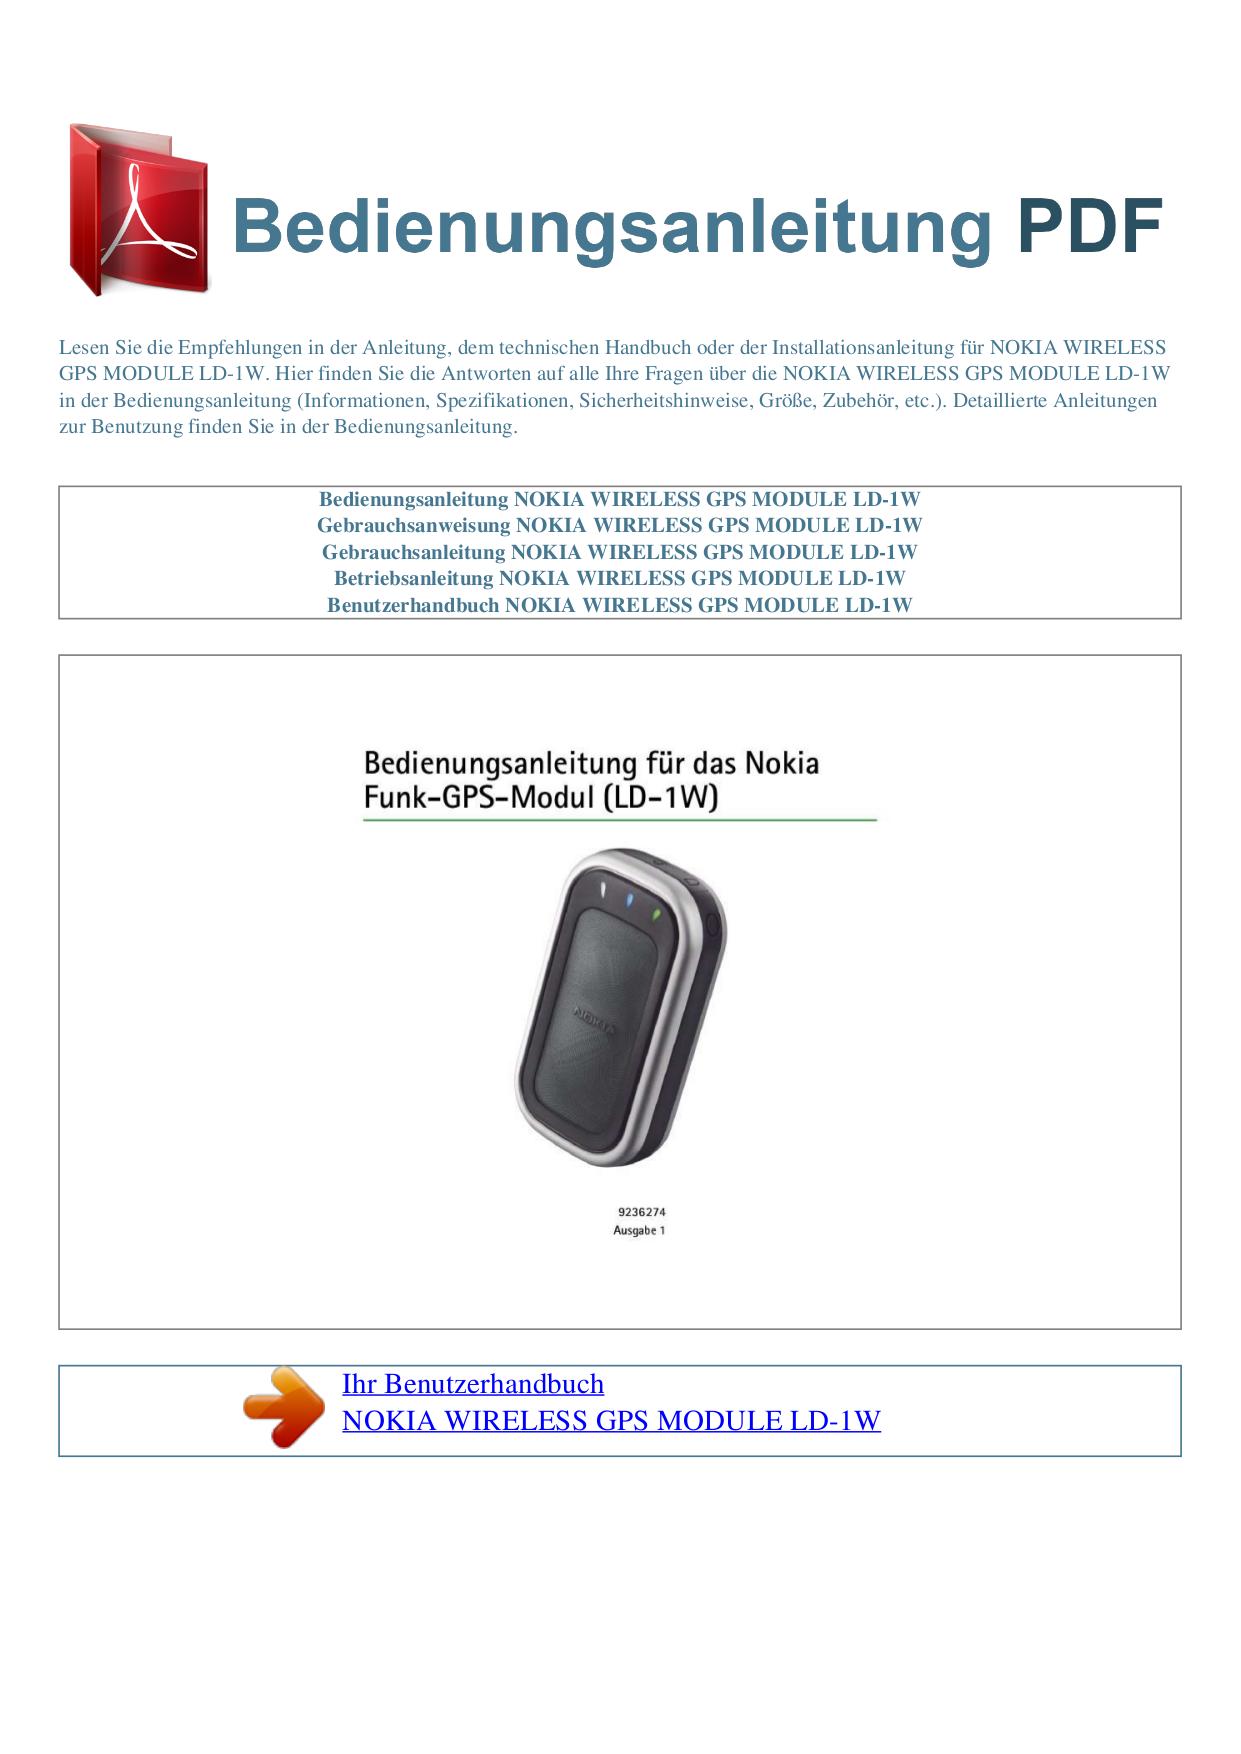 pdf for Nokia GPS LD-1W manual